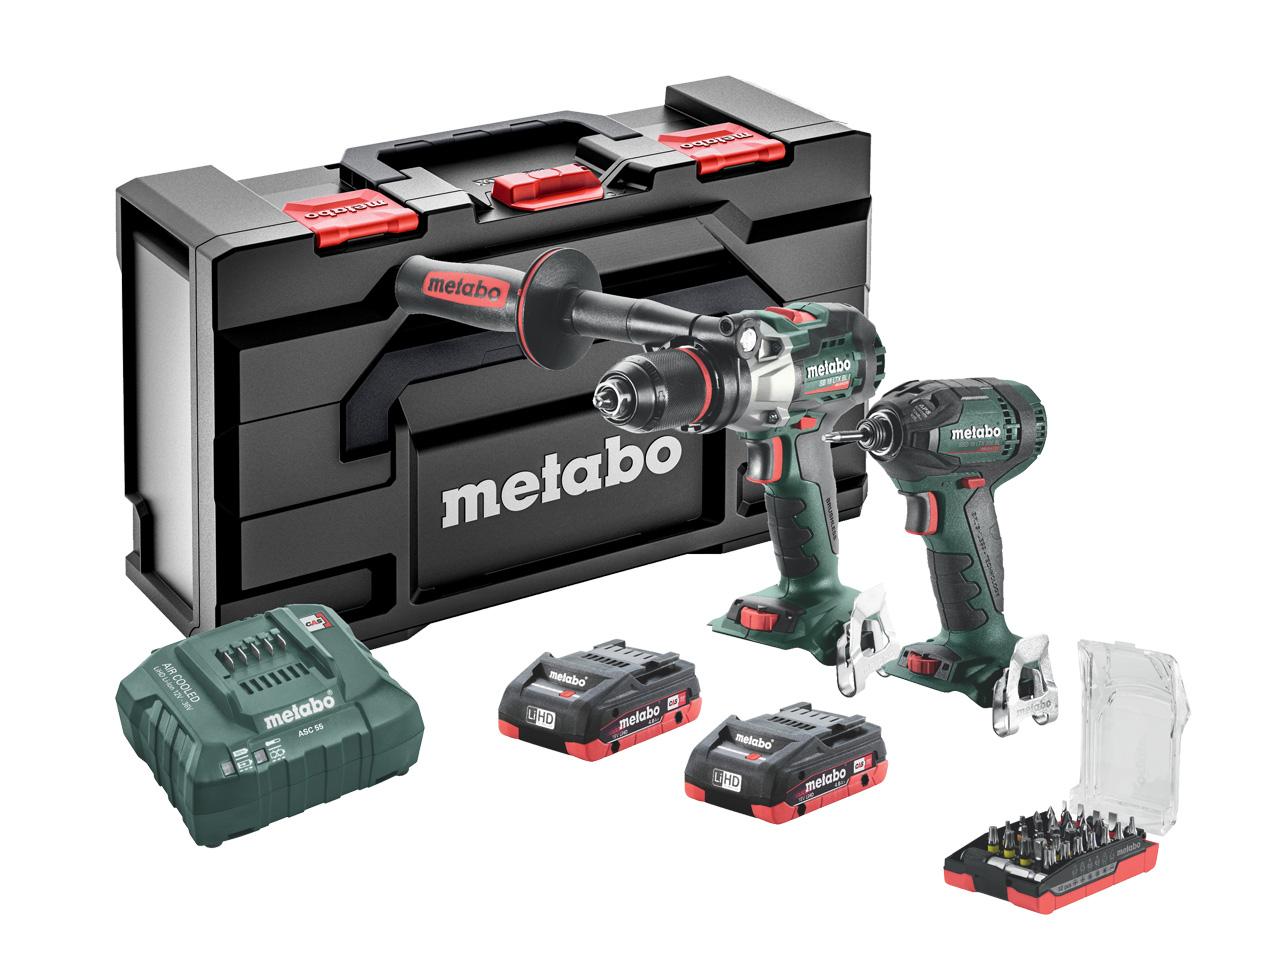 Metabo_UK685184040.jpg